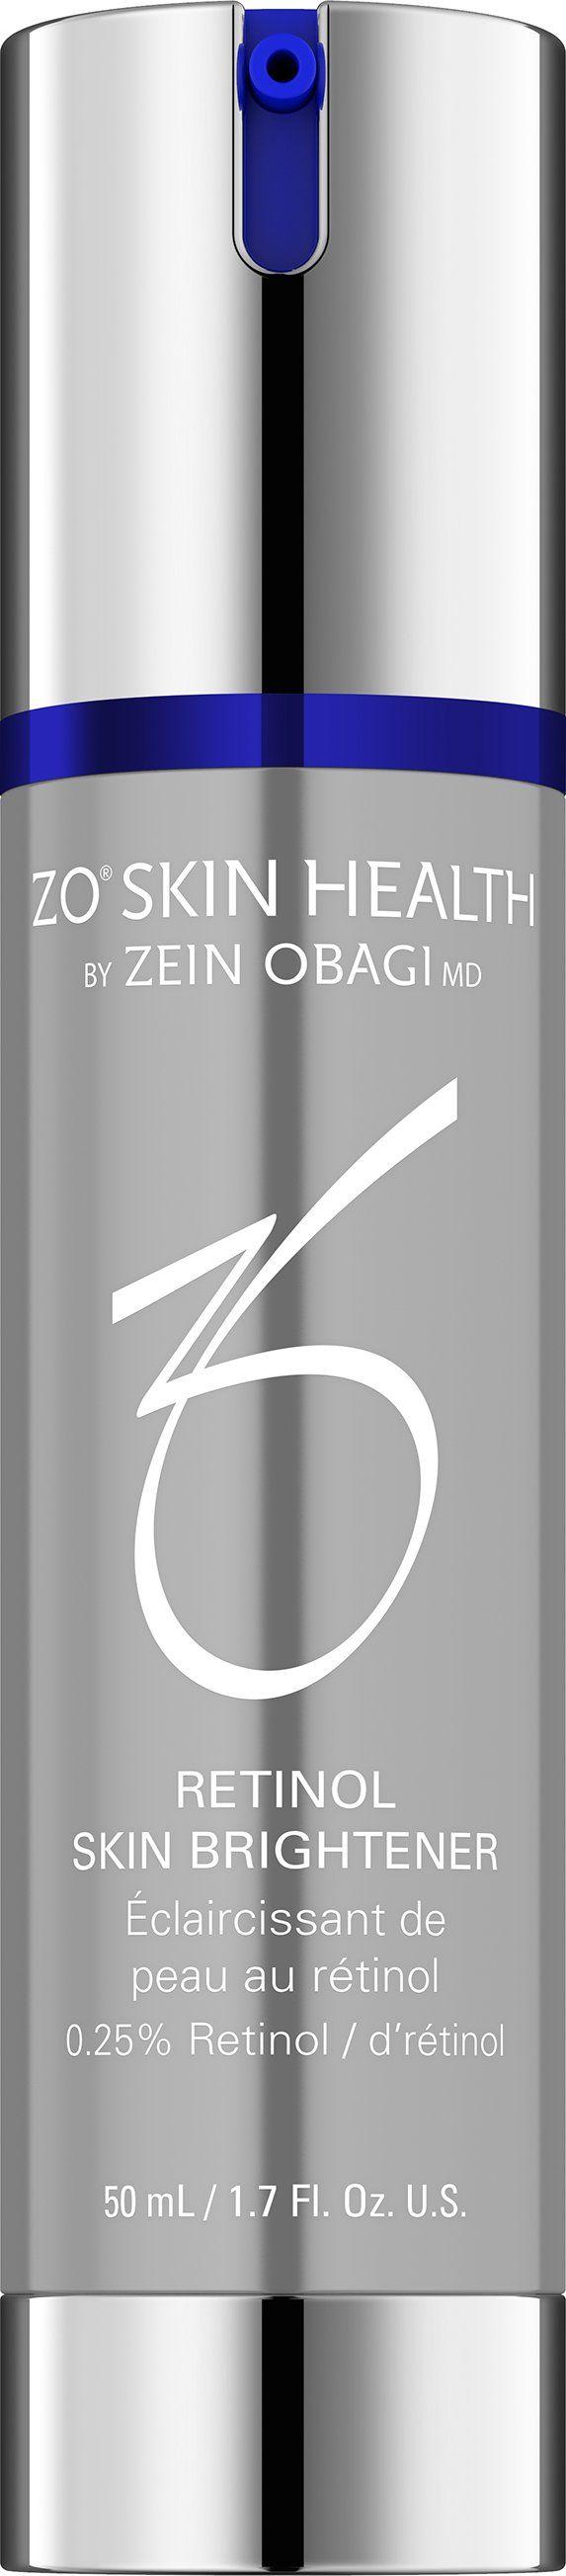 ZO Skin Health Retinol Skin Brightener 0.25% (50 ml / 1.7 fl oz)